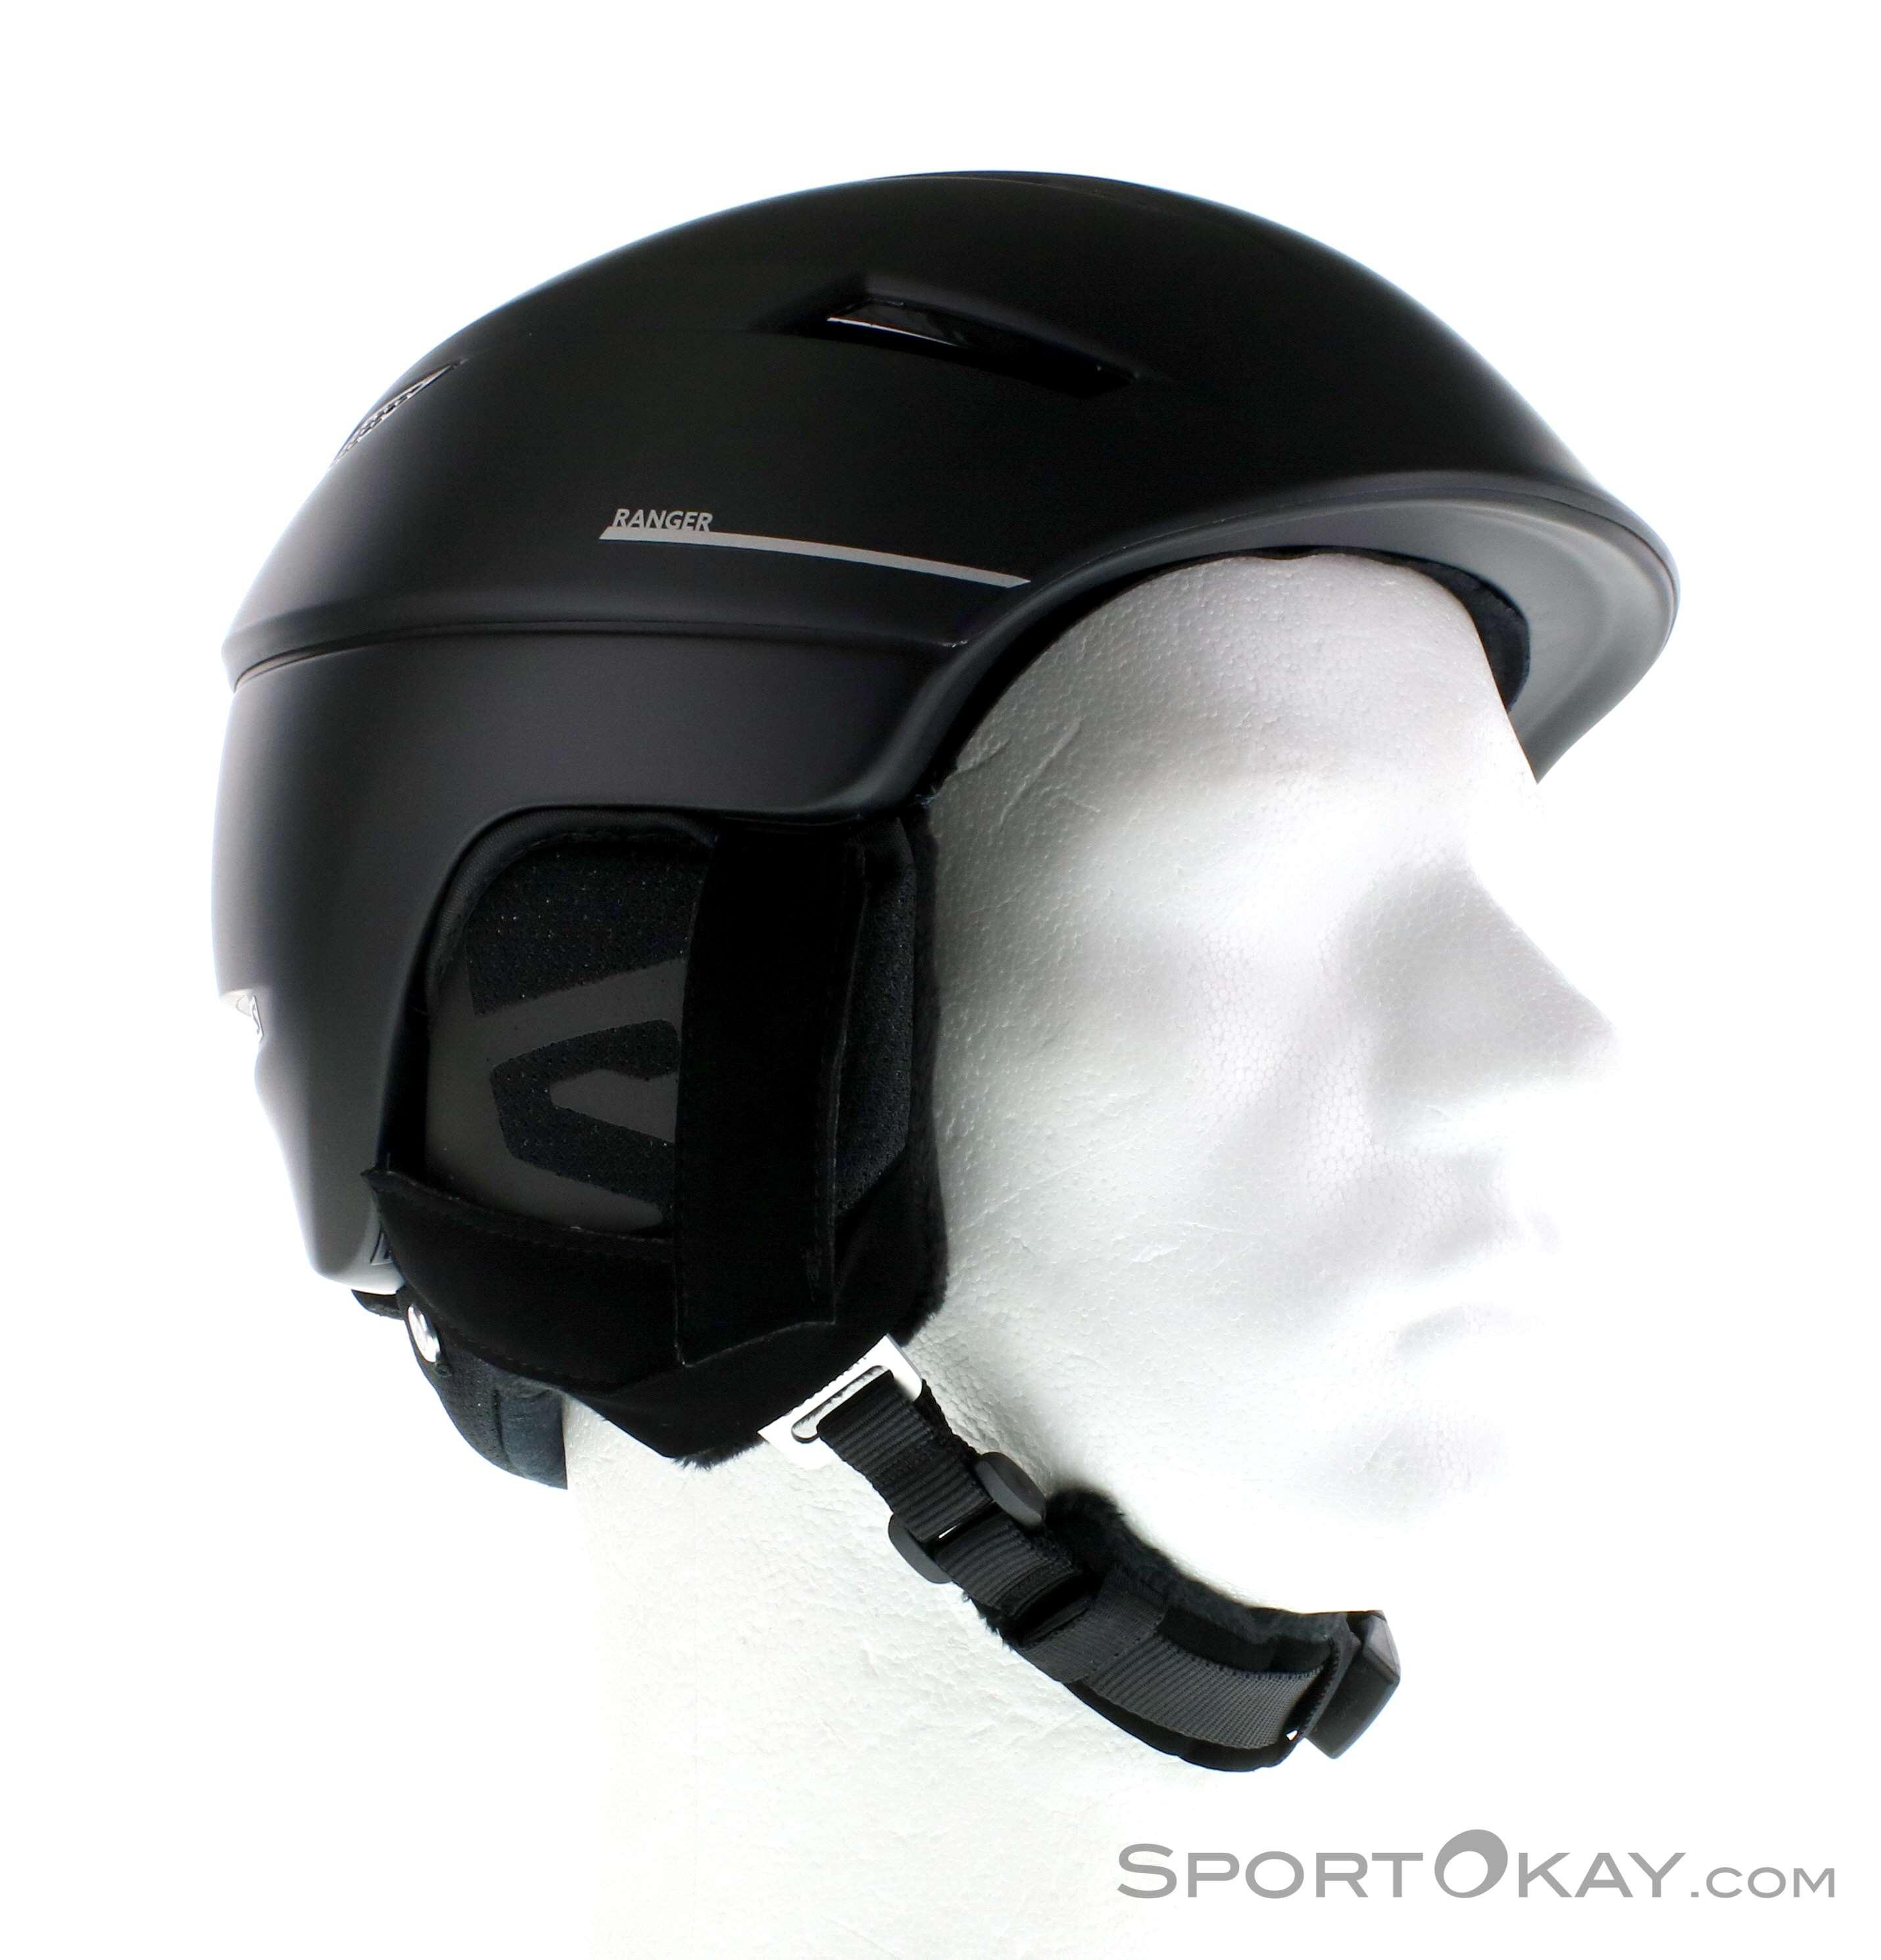 Salomon Salomon Ranger 2 Custom Air Ski Helmet oIbrn